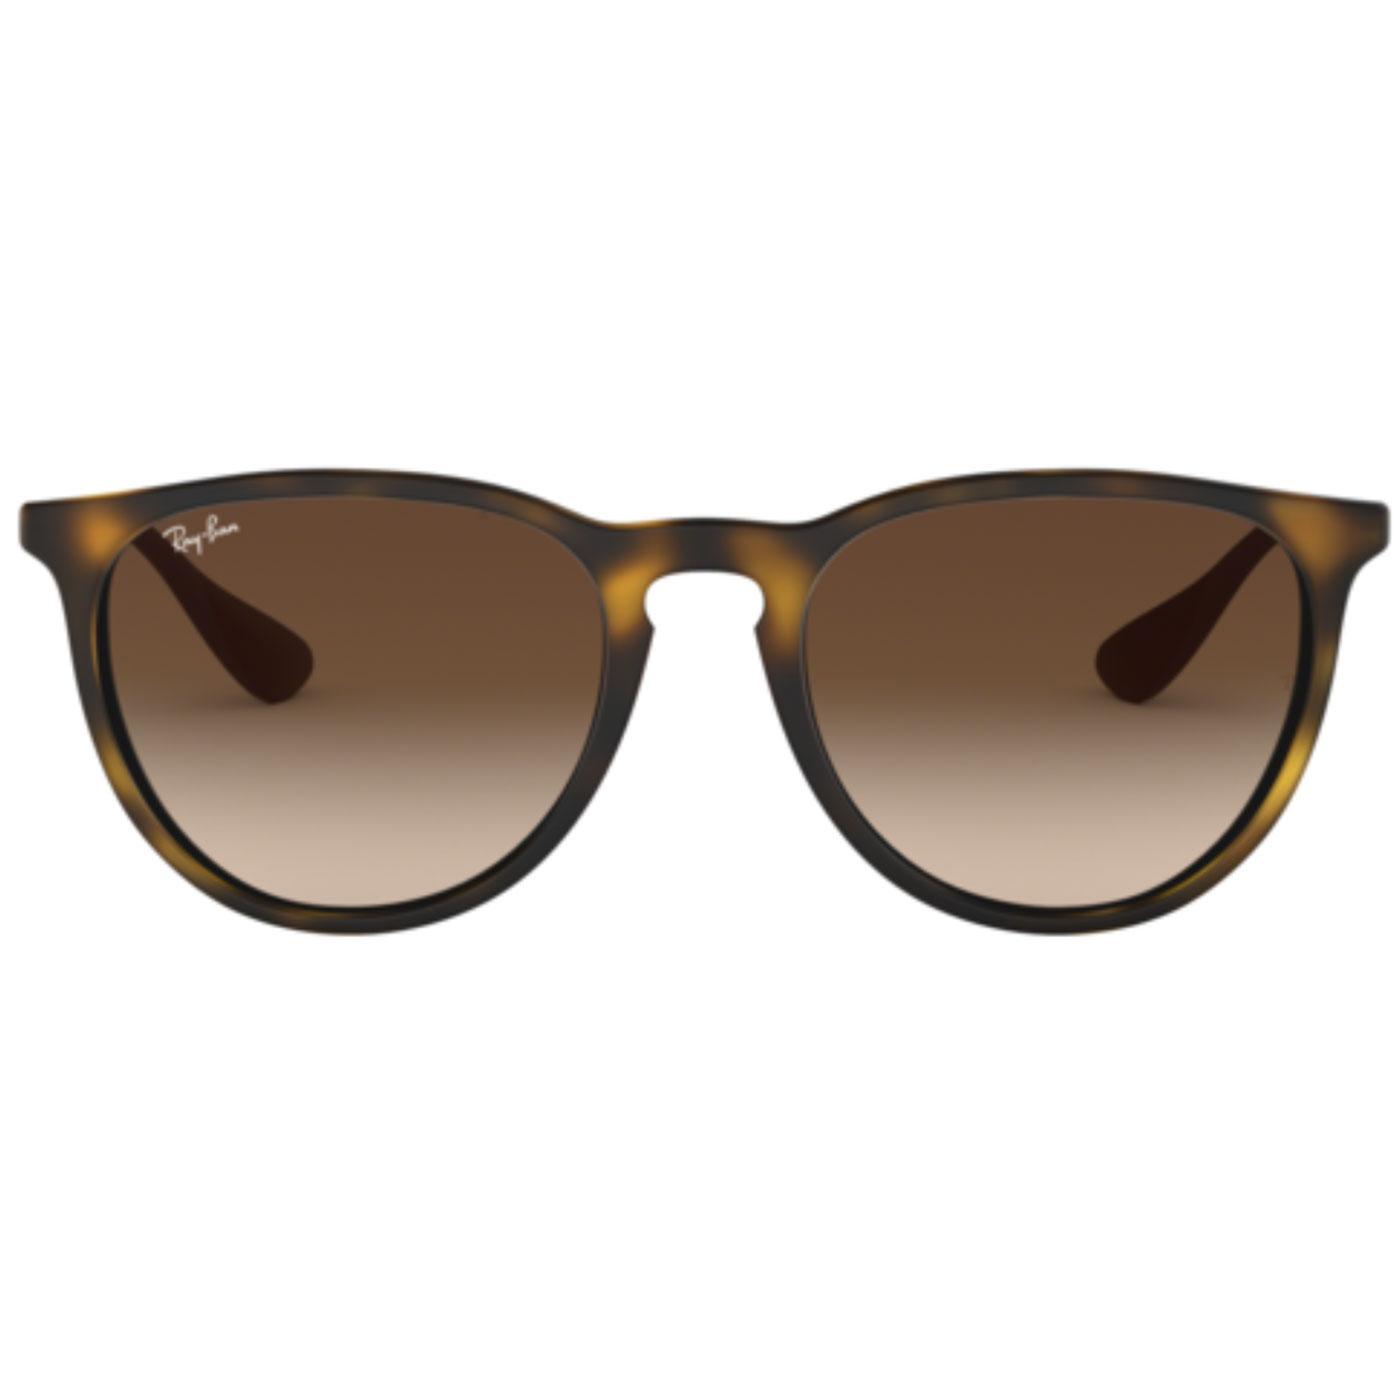 Erika RAY-BAN Retro Mod 60s Wayfarer Sunglasses